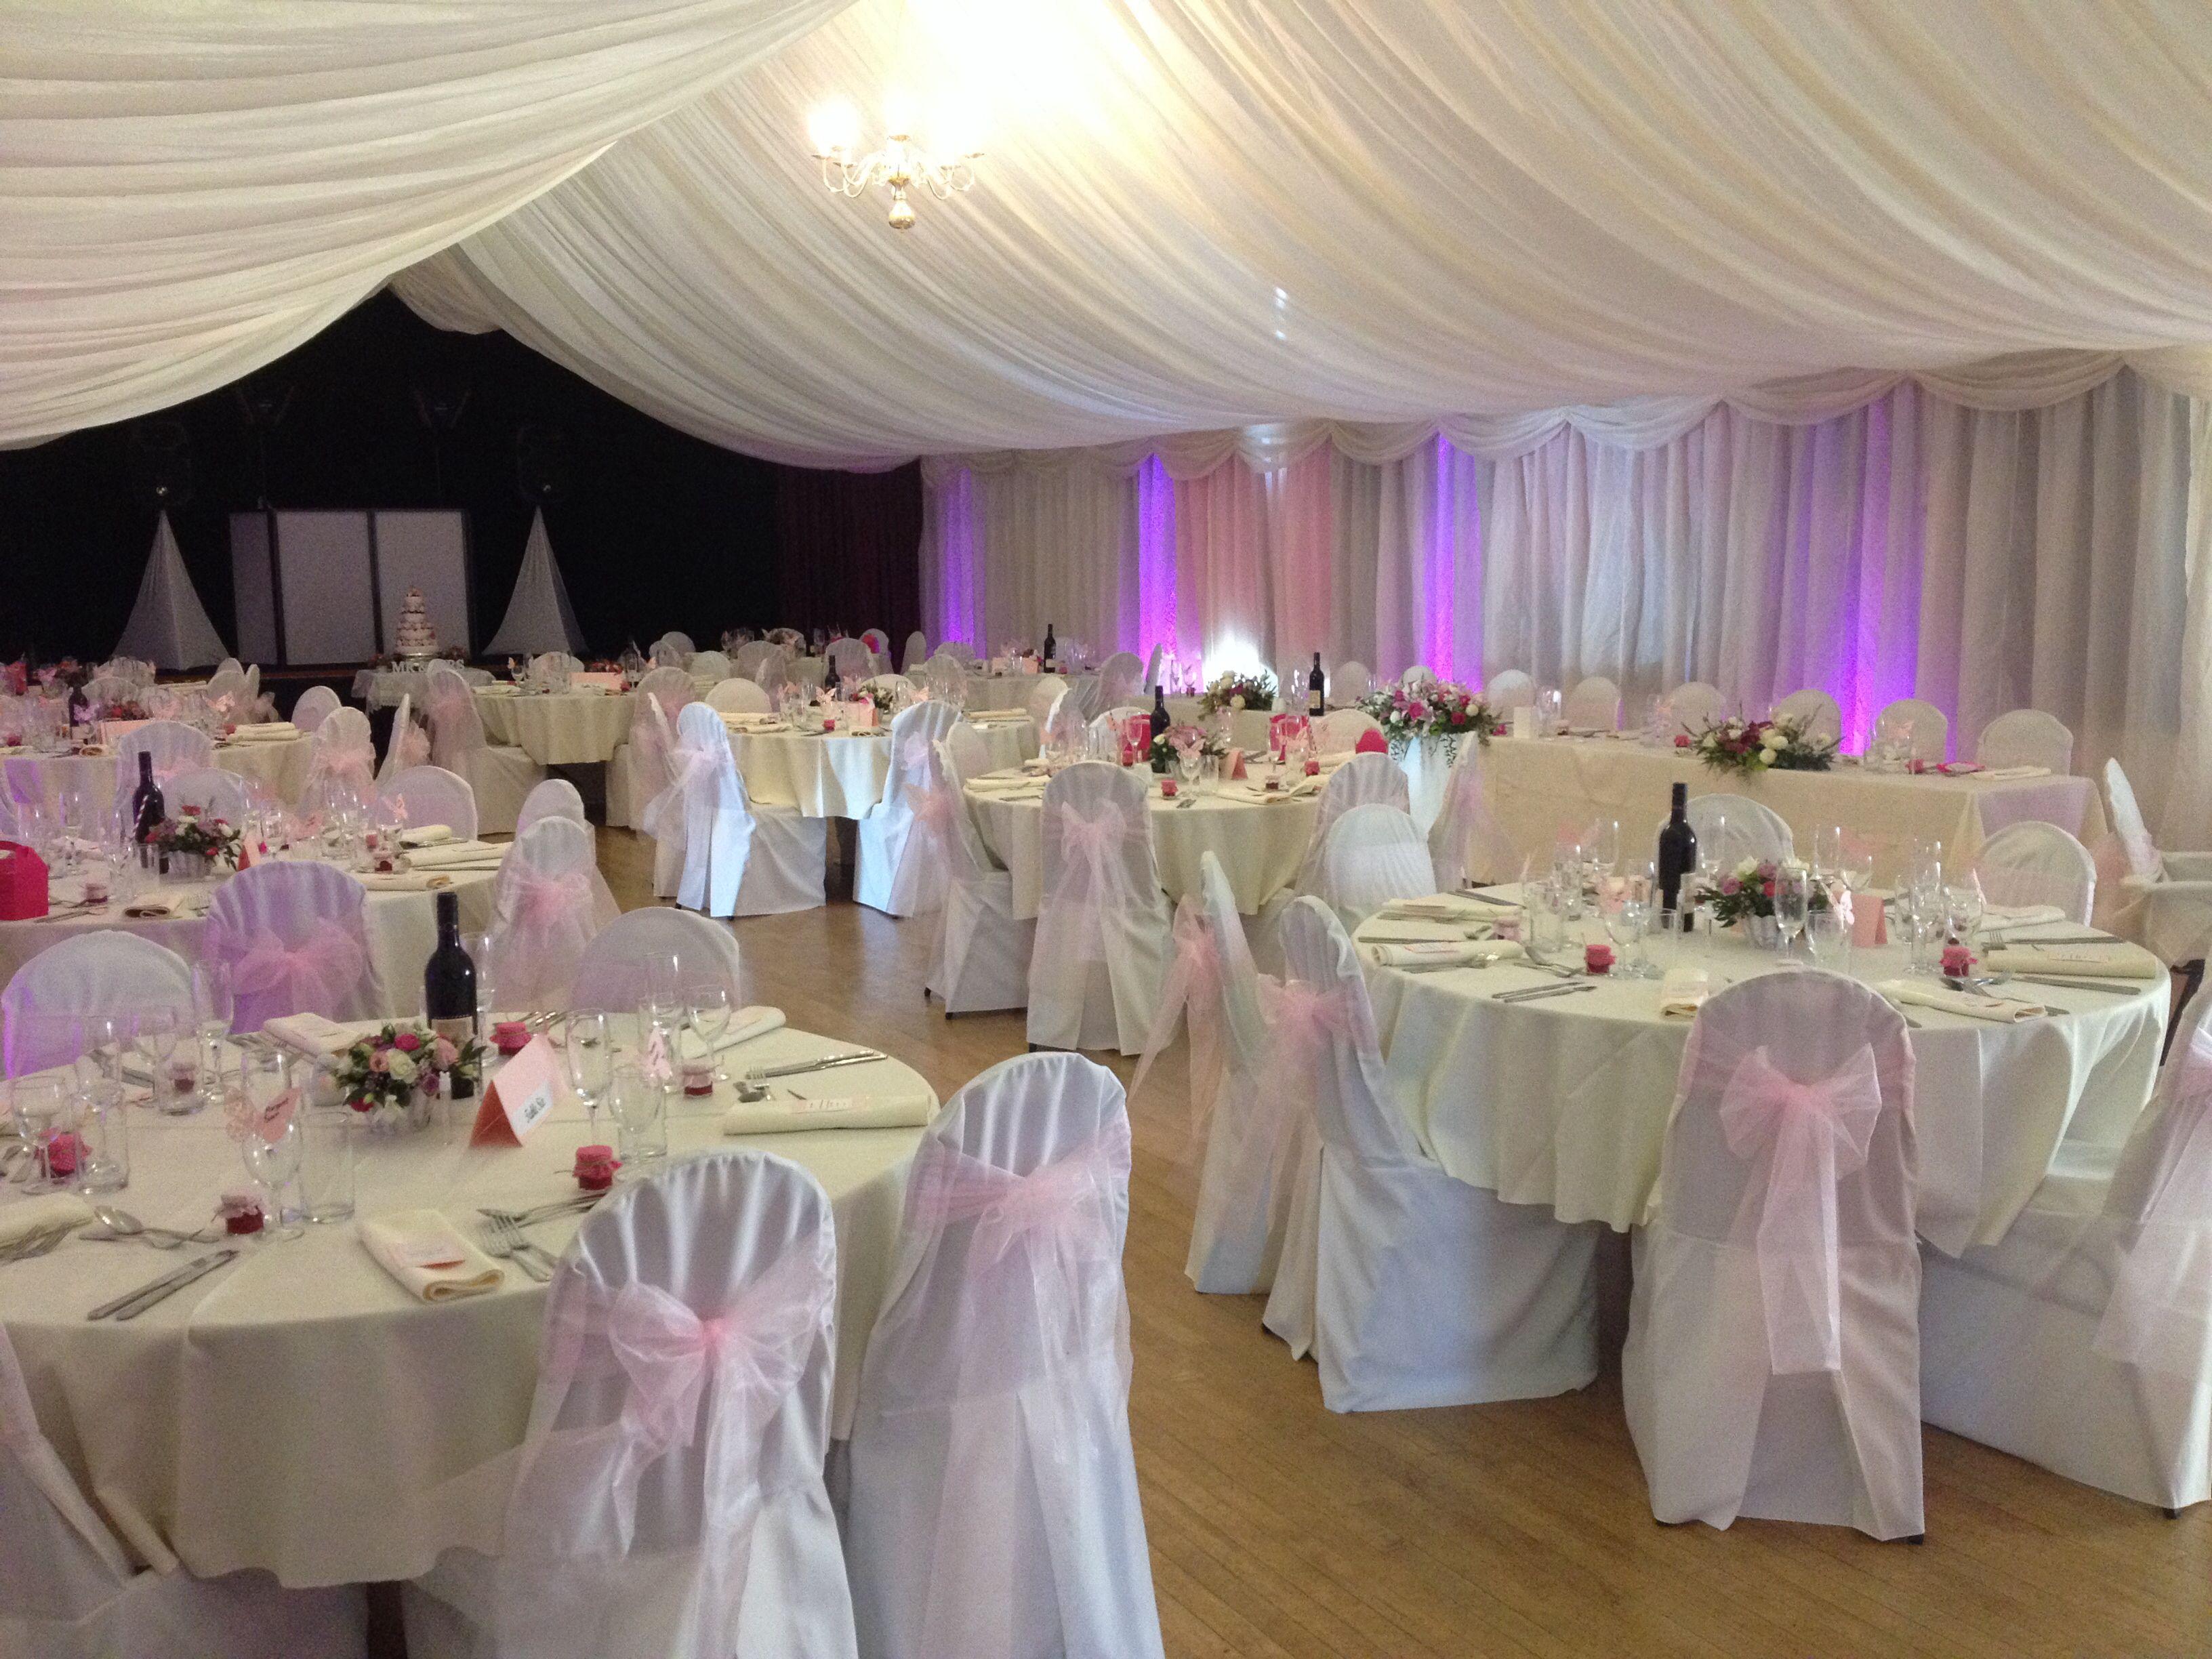 Pink and maroon wedding decor  Beautiful wedding decoration at hoverparishhall  Weddings